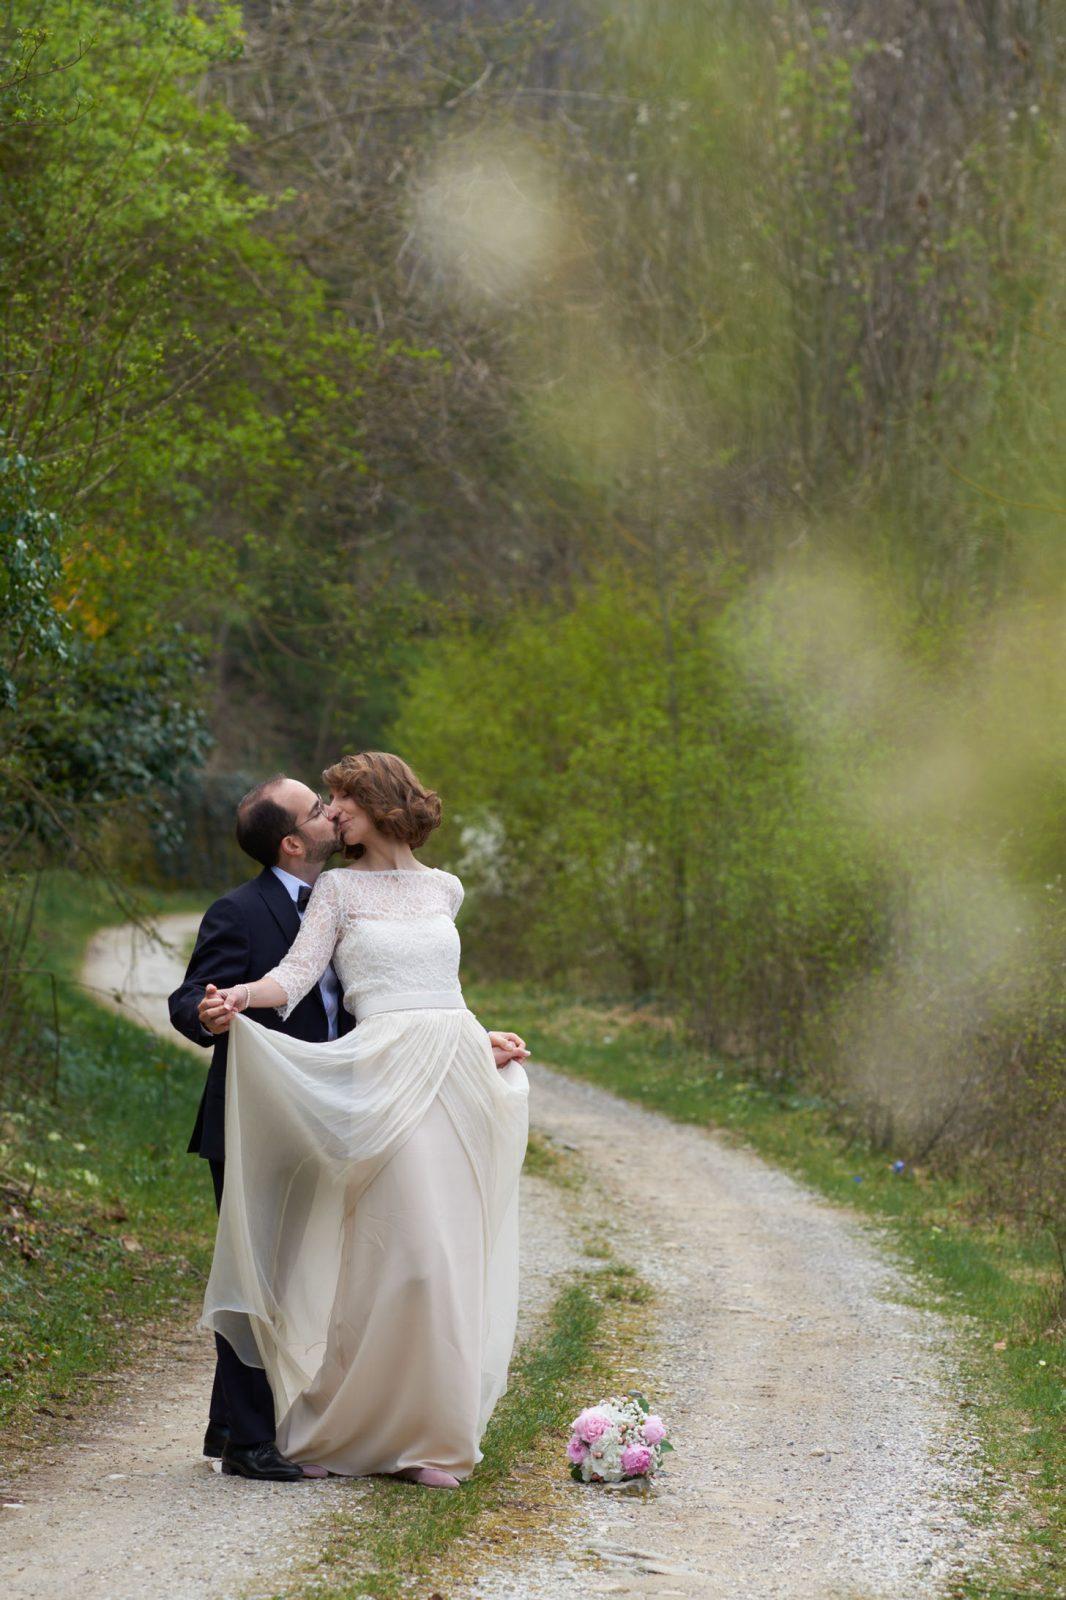 traditional wedding dress, classic wedding, lace wedding separates, italian vintage wedding